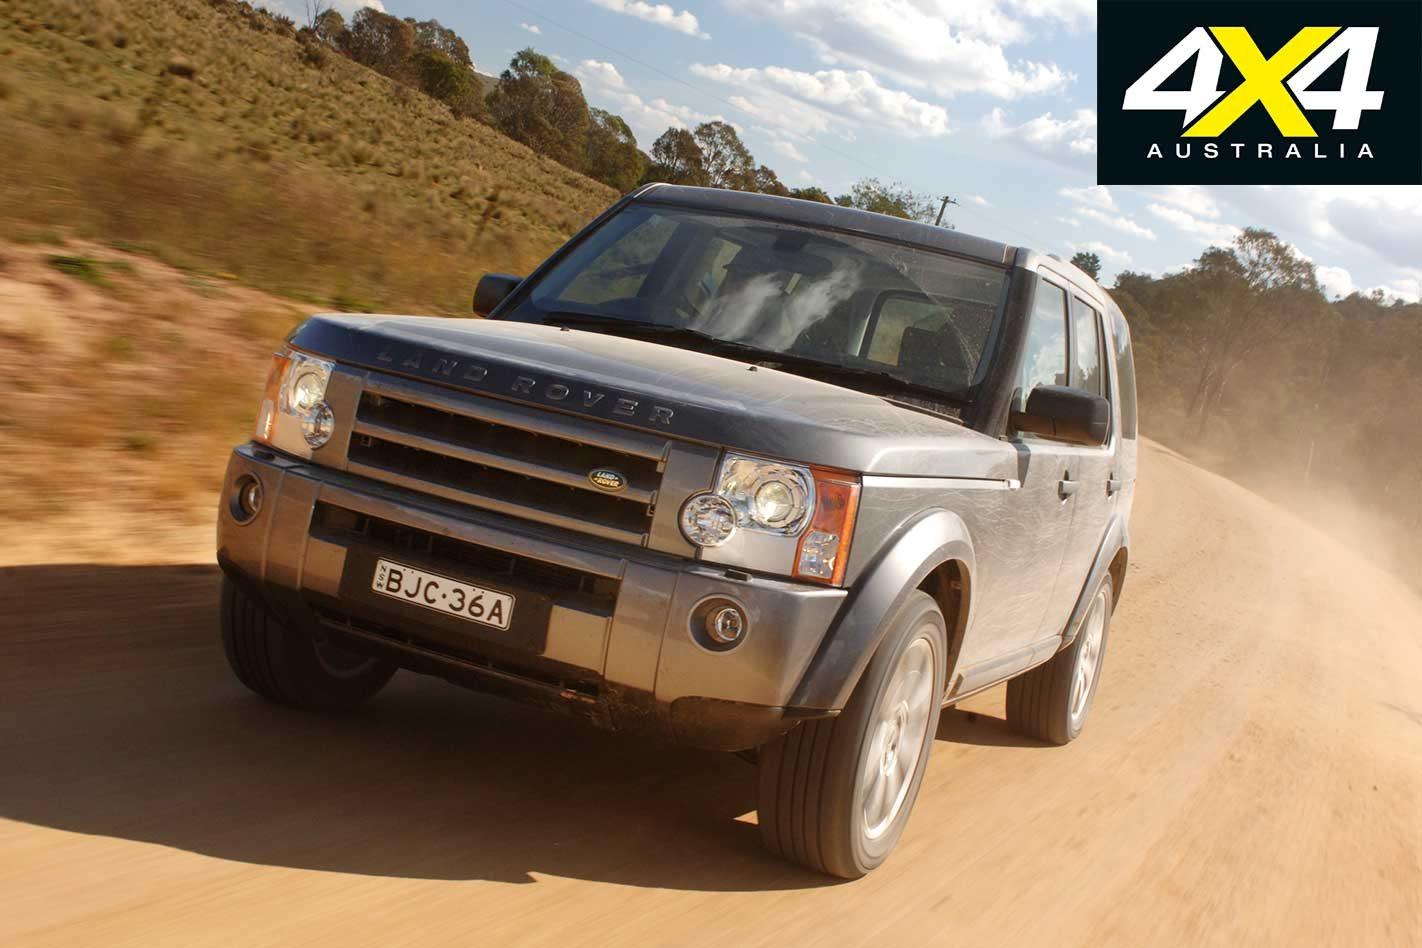 2009 Land Rover Discovery 3 vs Toyota LandCruiser 200 vs